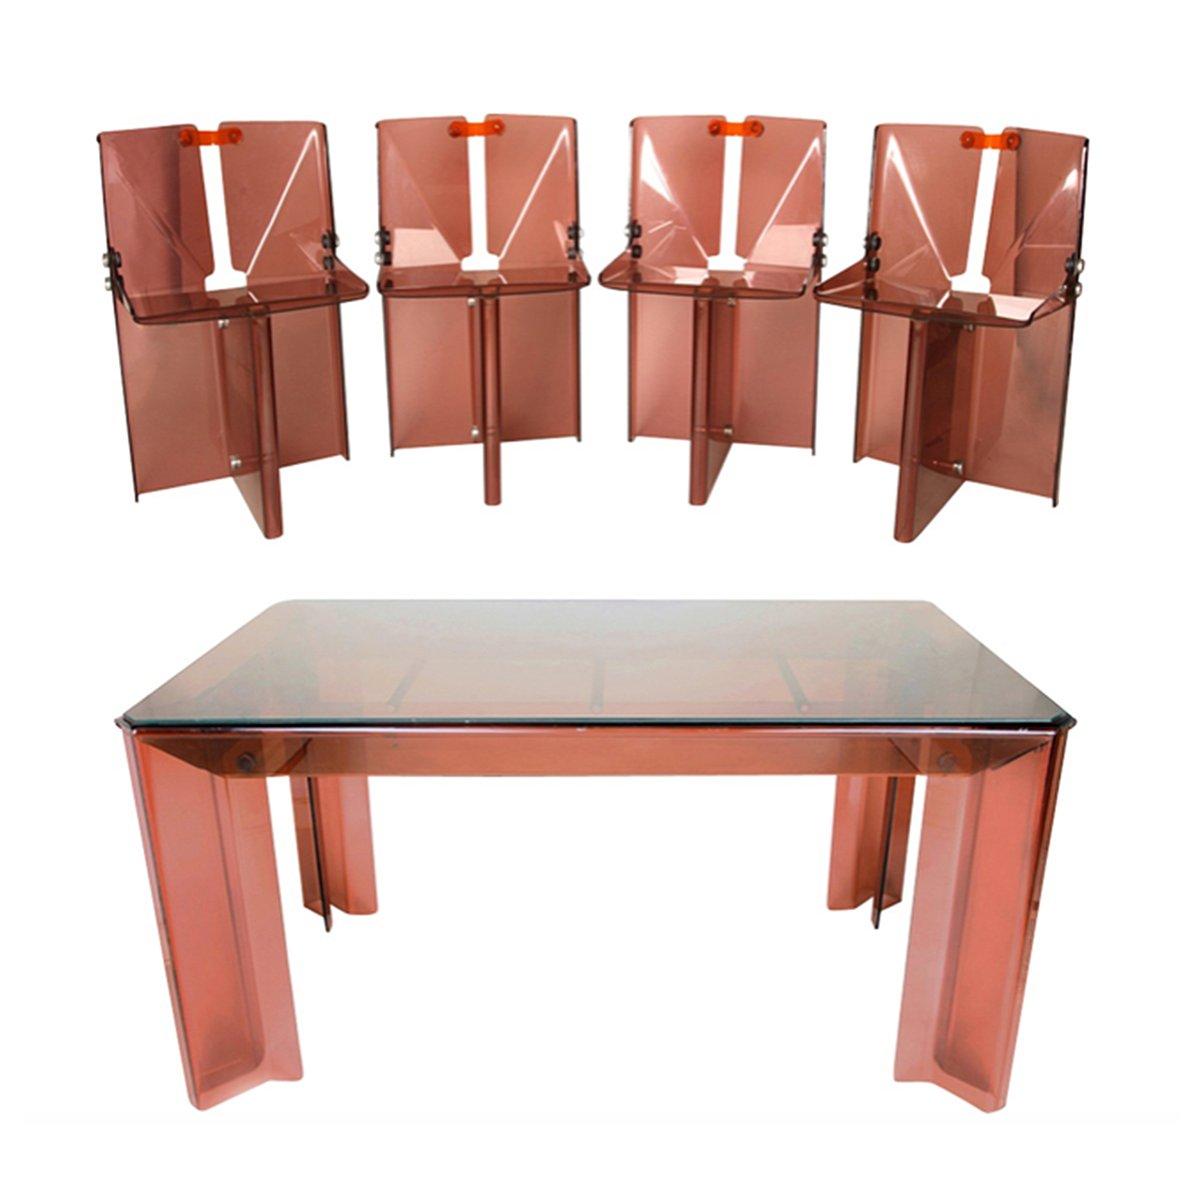 Tavolo da pranzo vintage in perspex con sedie in vendita for Tavolo da pranzo con sedie